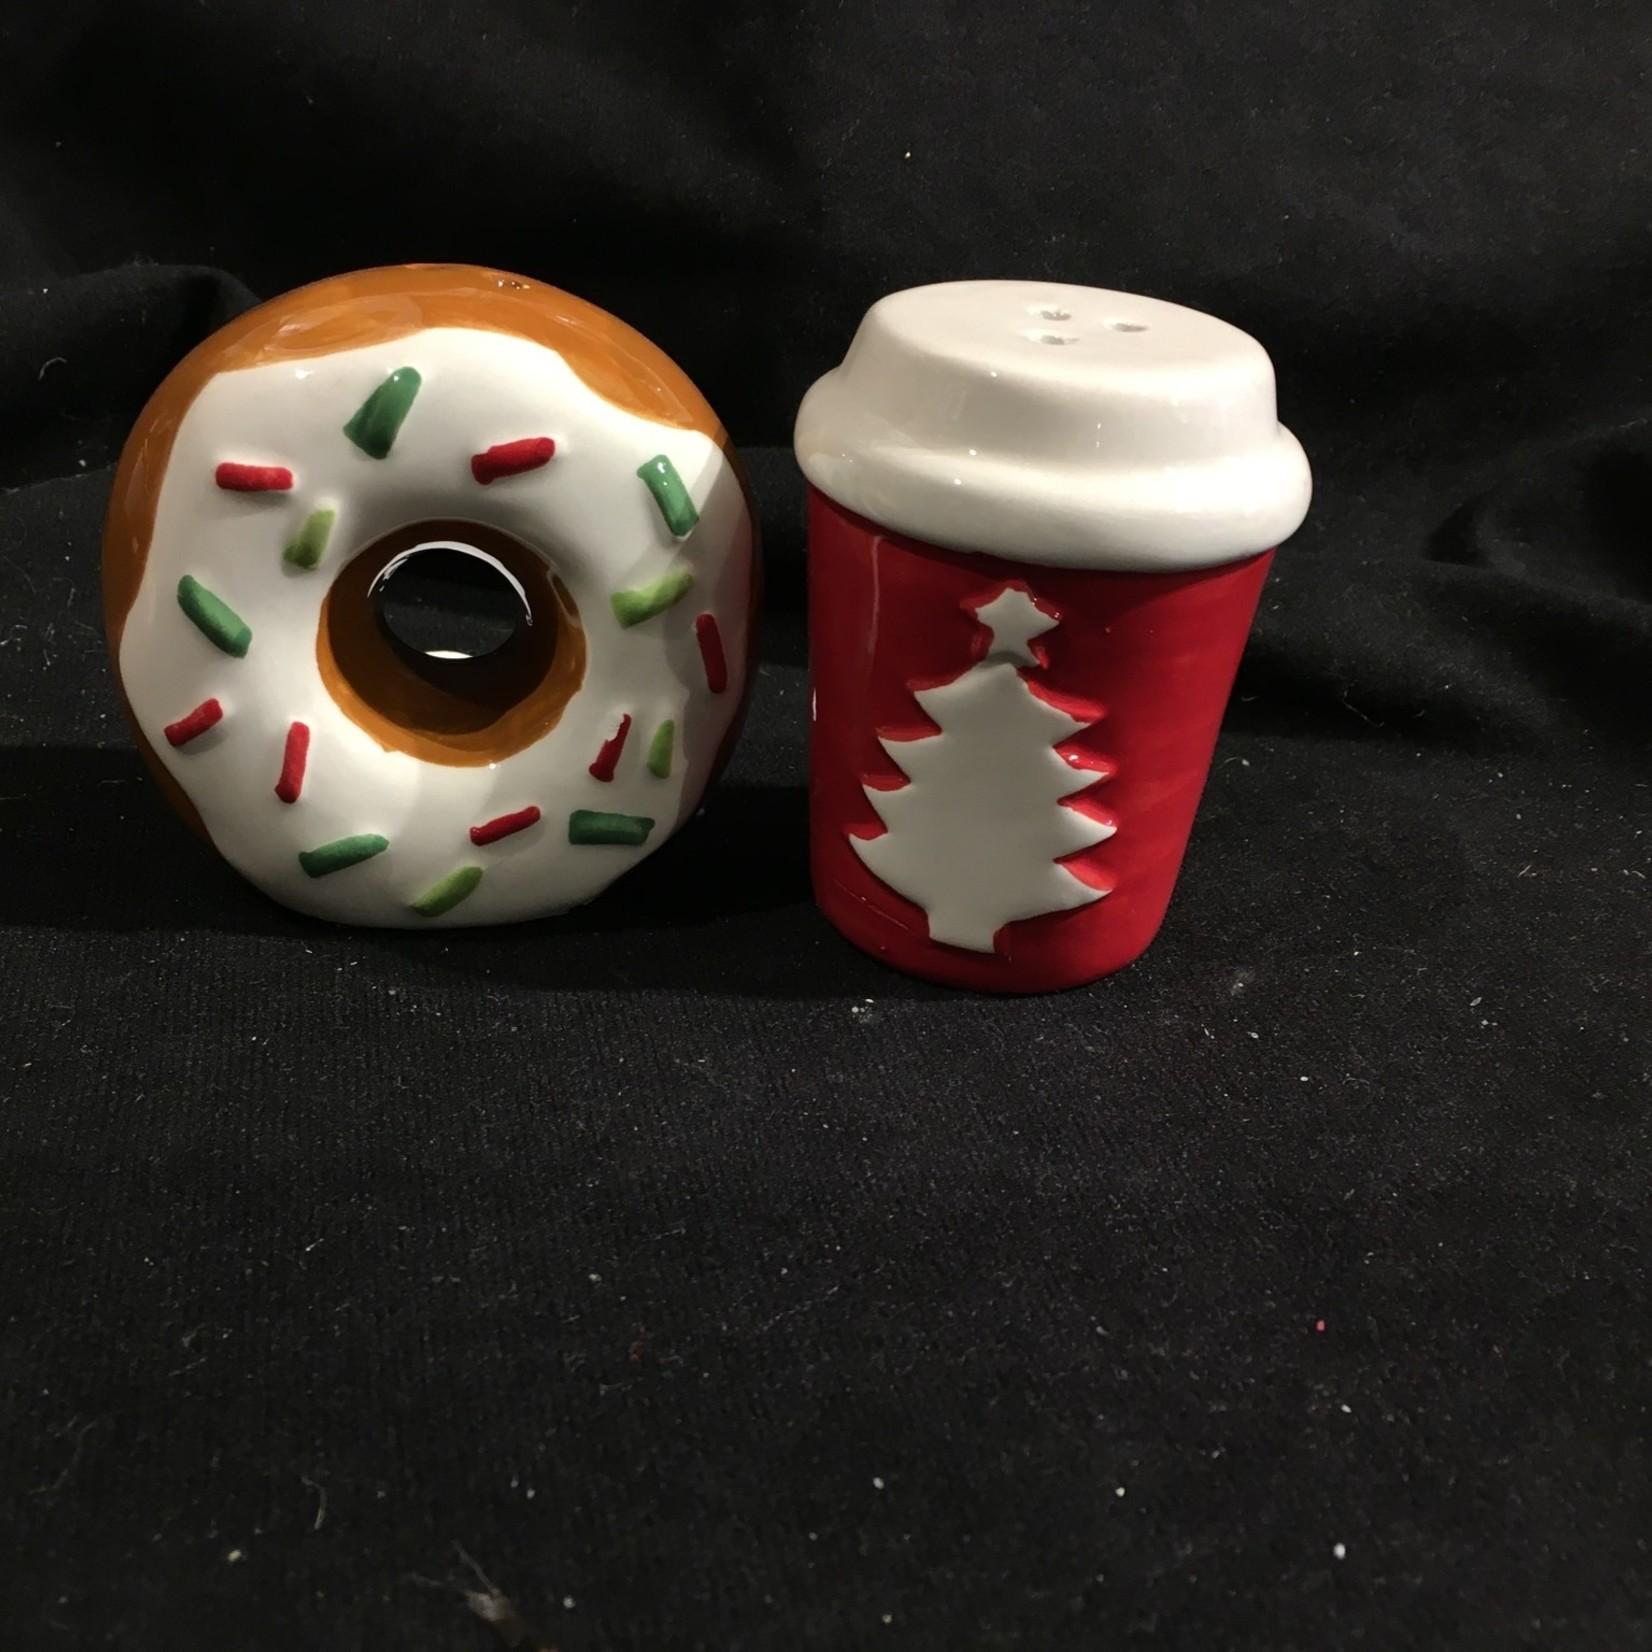 Donut & Coffee Salt & Pepper